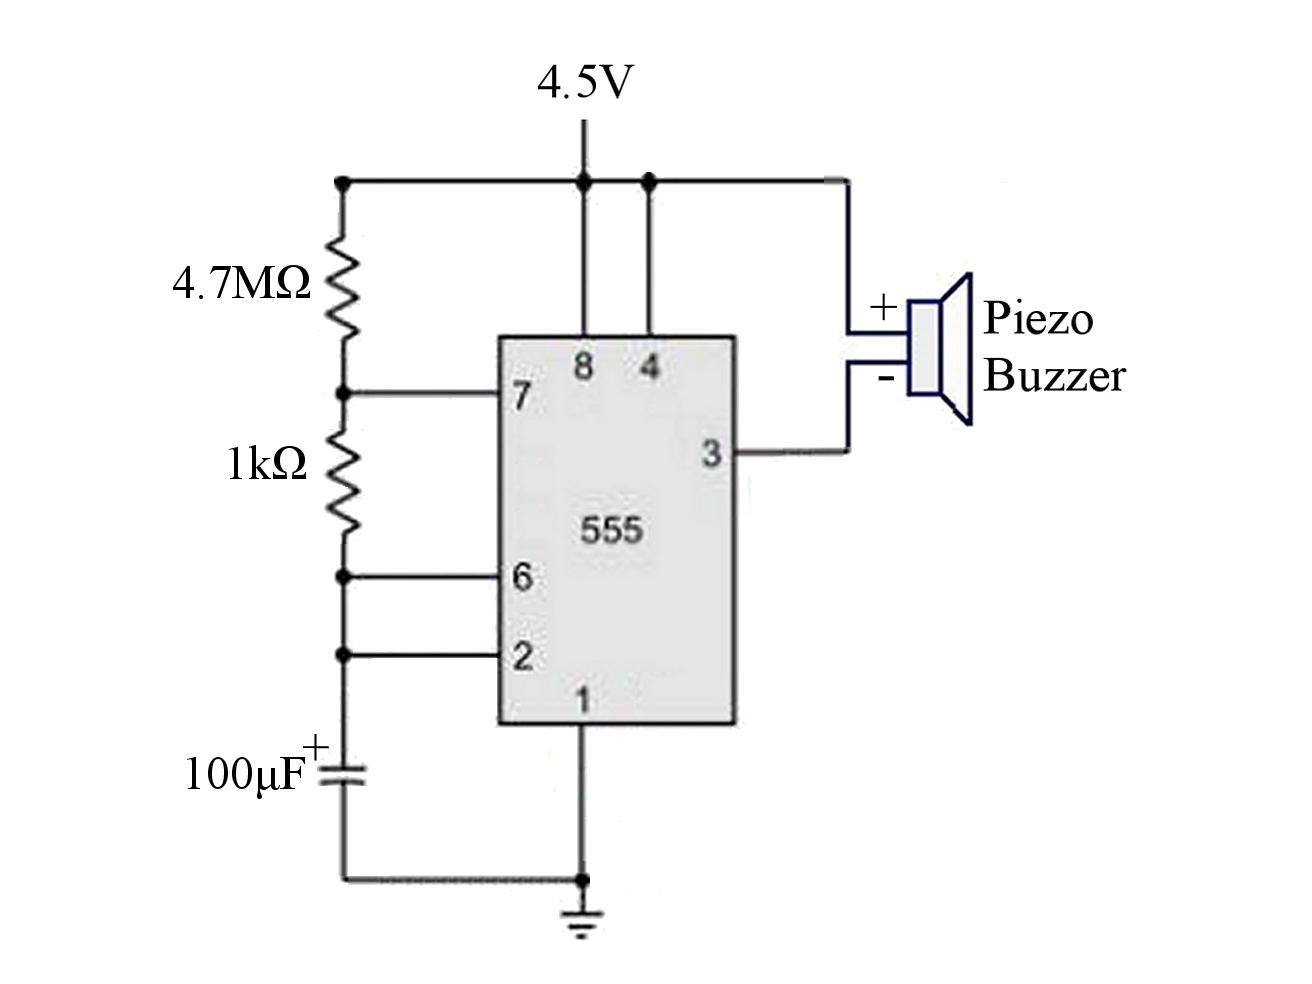 Piezo Buzzer Circuit Diagram Expert Schematics Wiring 1 99 5vac Breadboard Compatible Tinkersphere Otherwise